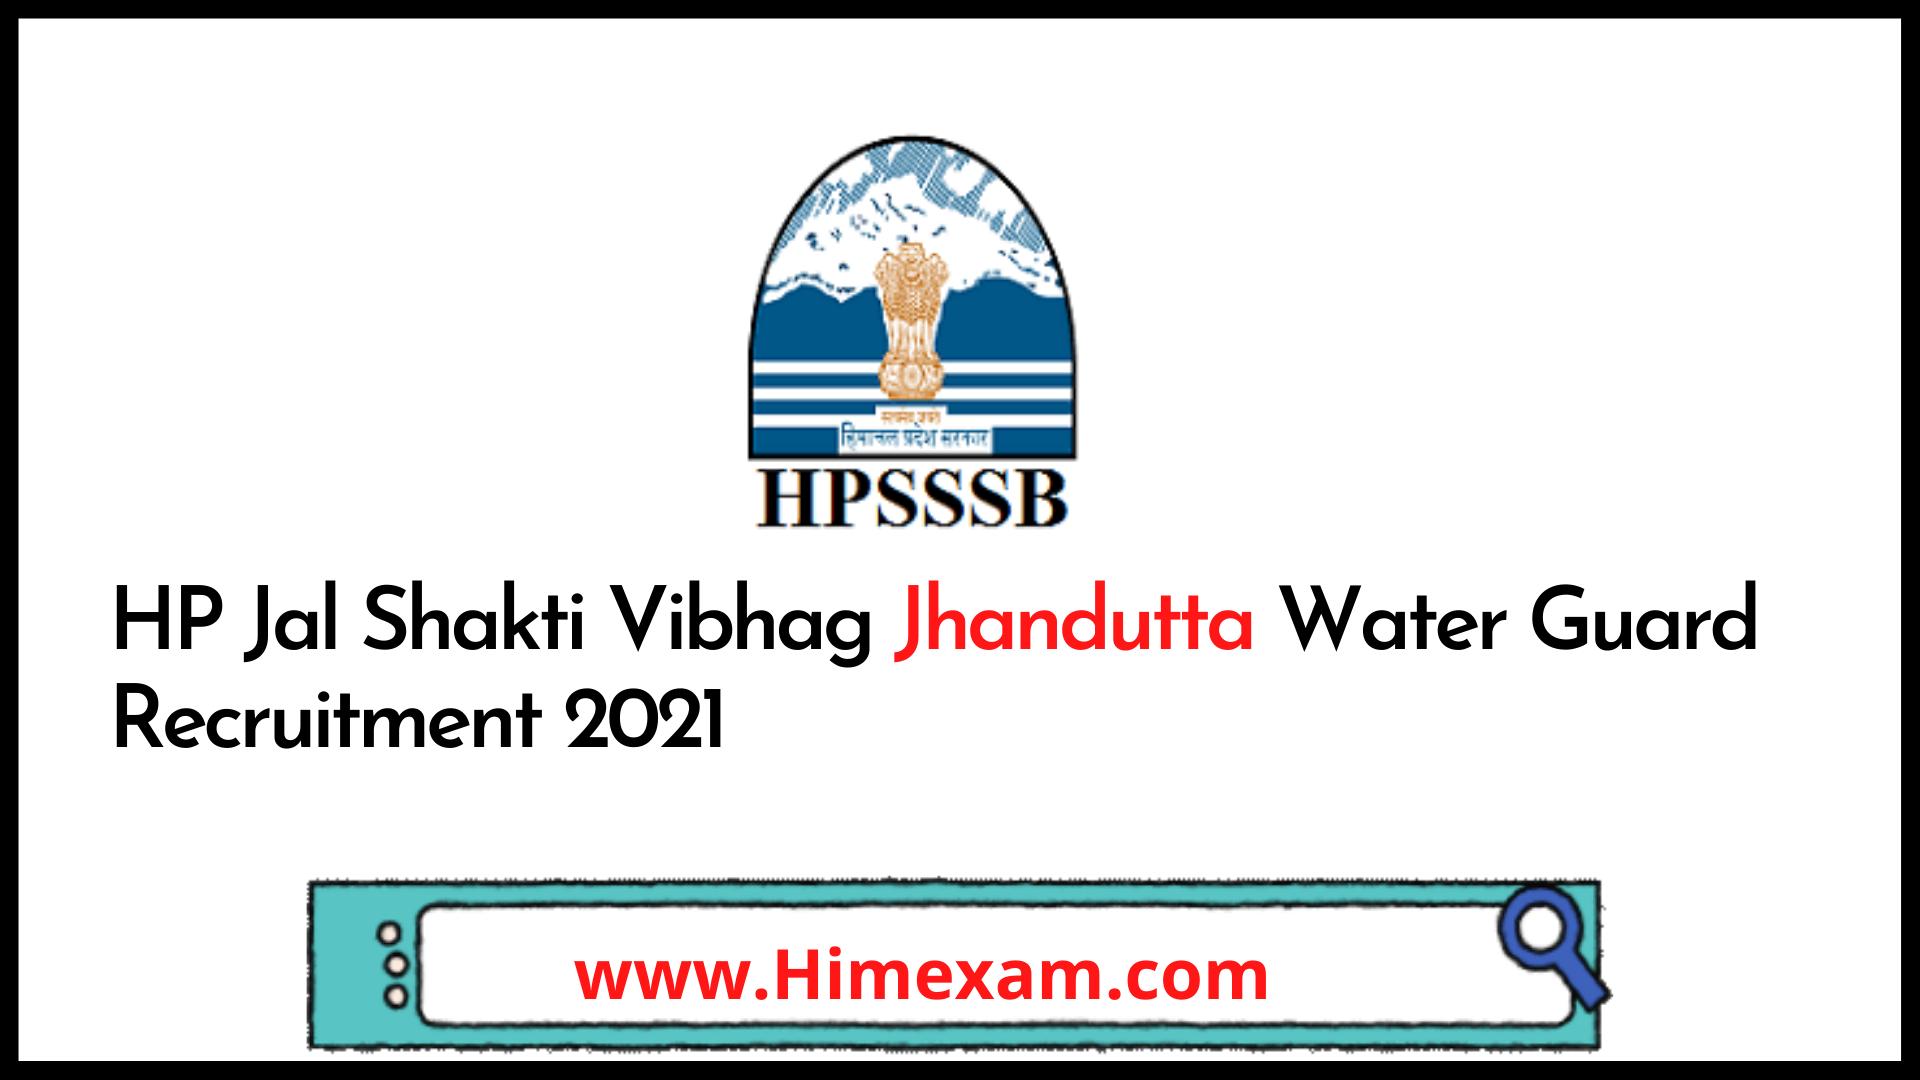 hp jal shakti vibhag jhandutta Water Guard Recruitment 2021